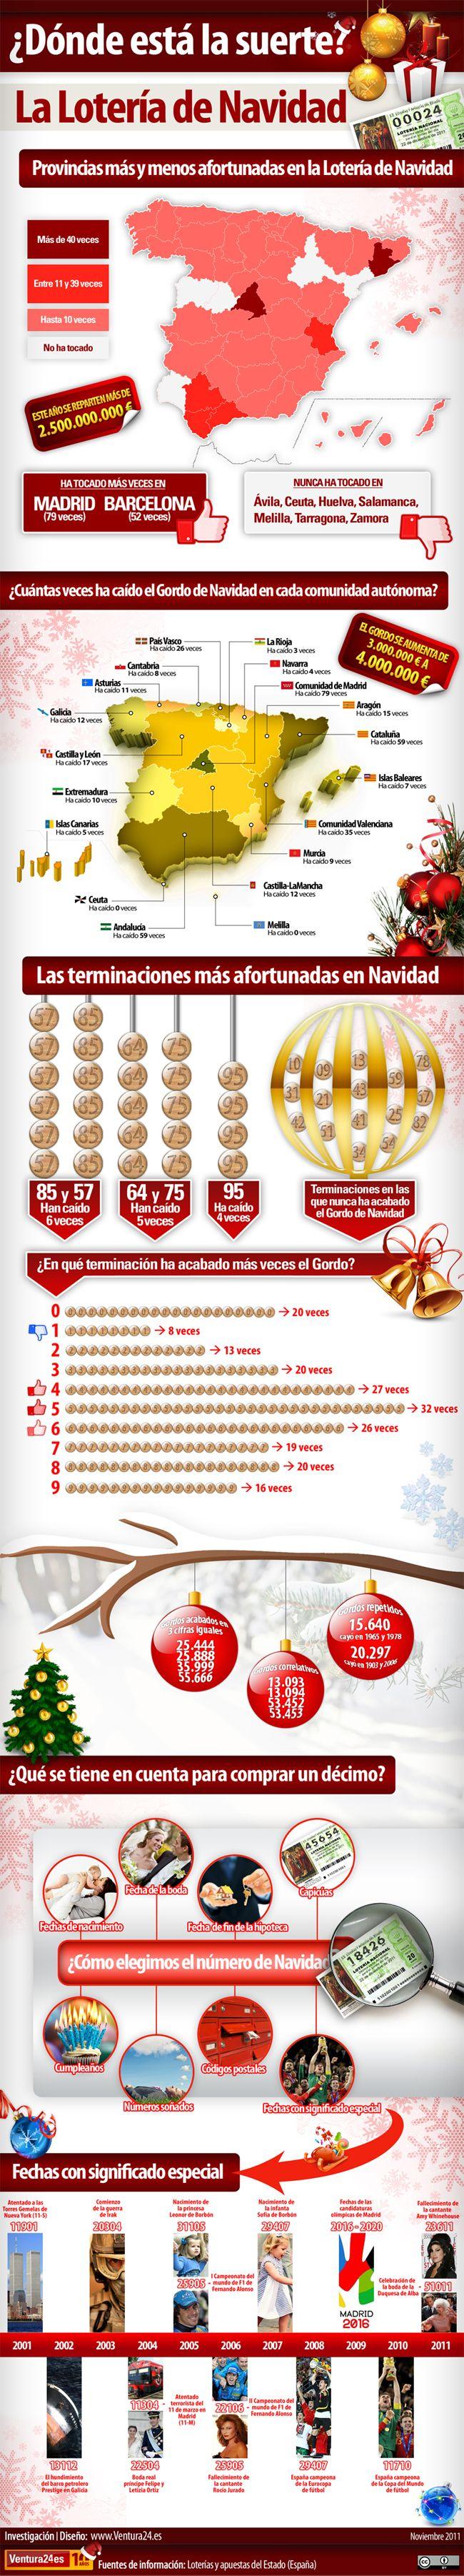 http://blog.ventura24.es/wp-content/uploads/2011/11/Infografia_Loteria_de_Navidad_2011_web_small2.jpg  Lotería de España